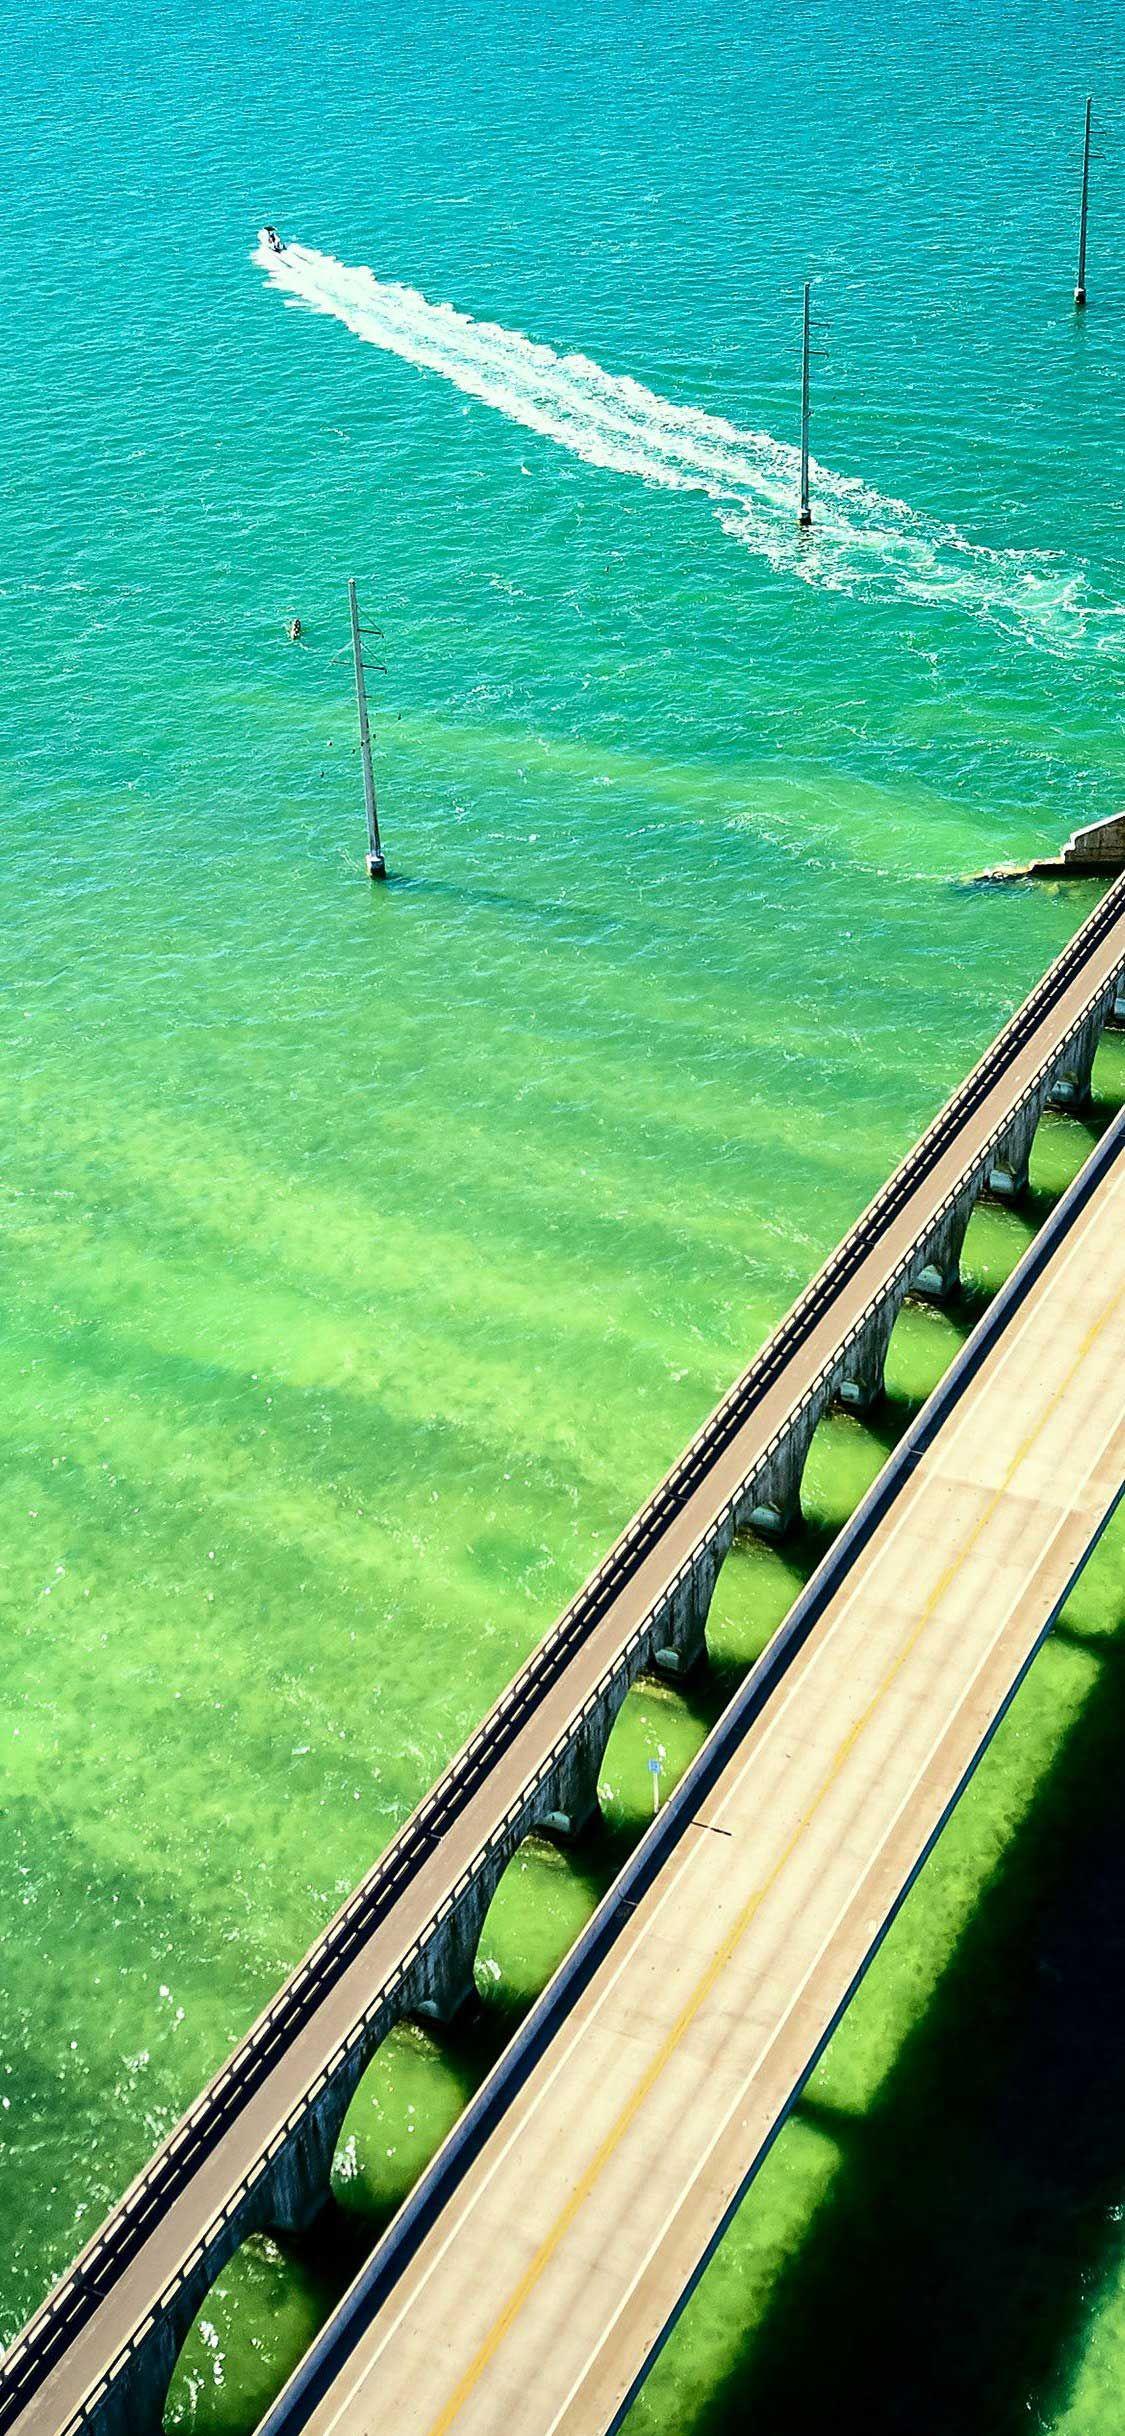 Iphone Wallpaper Seven Mile Bridge Aerial View Florida Keys United States Hd Hd Best Nature Wallpapers Iphone Wallpaper Aerial View